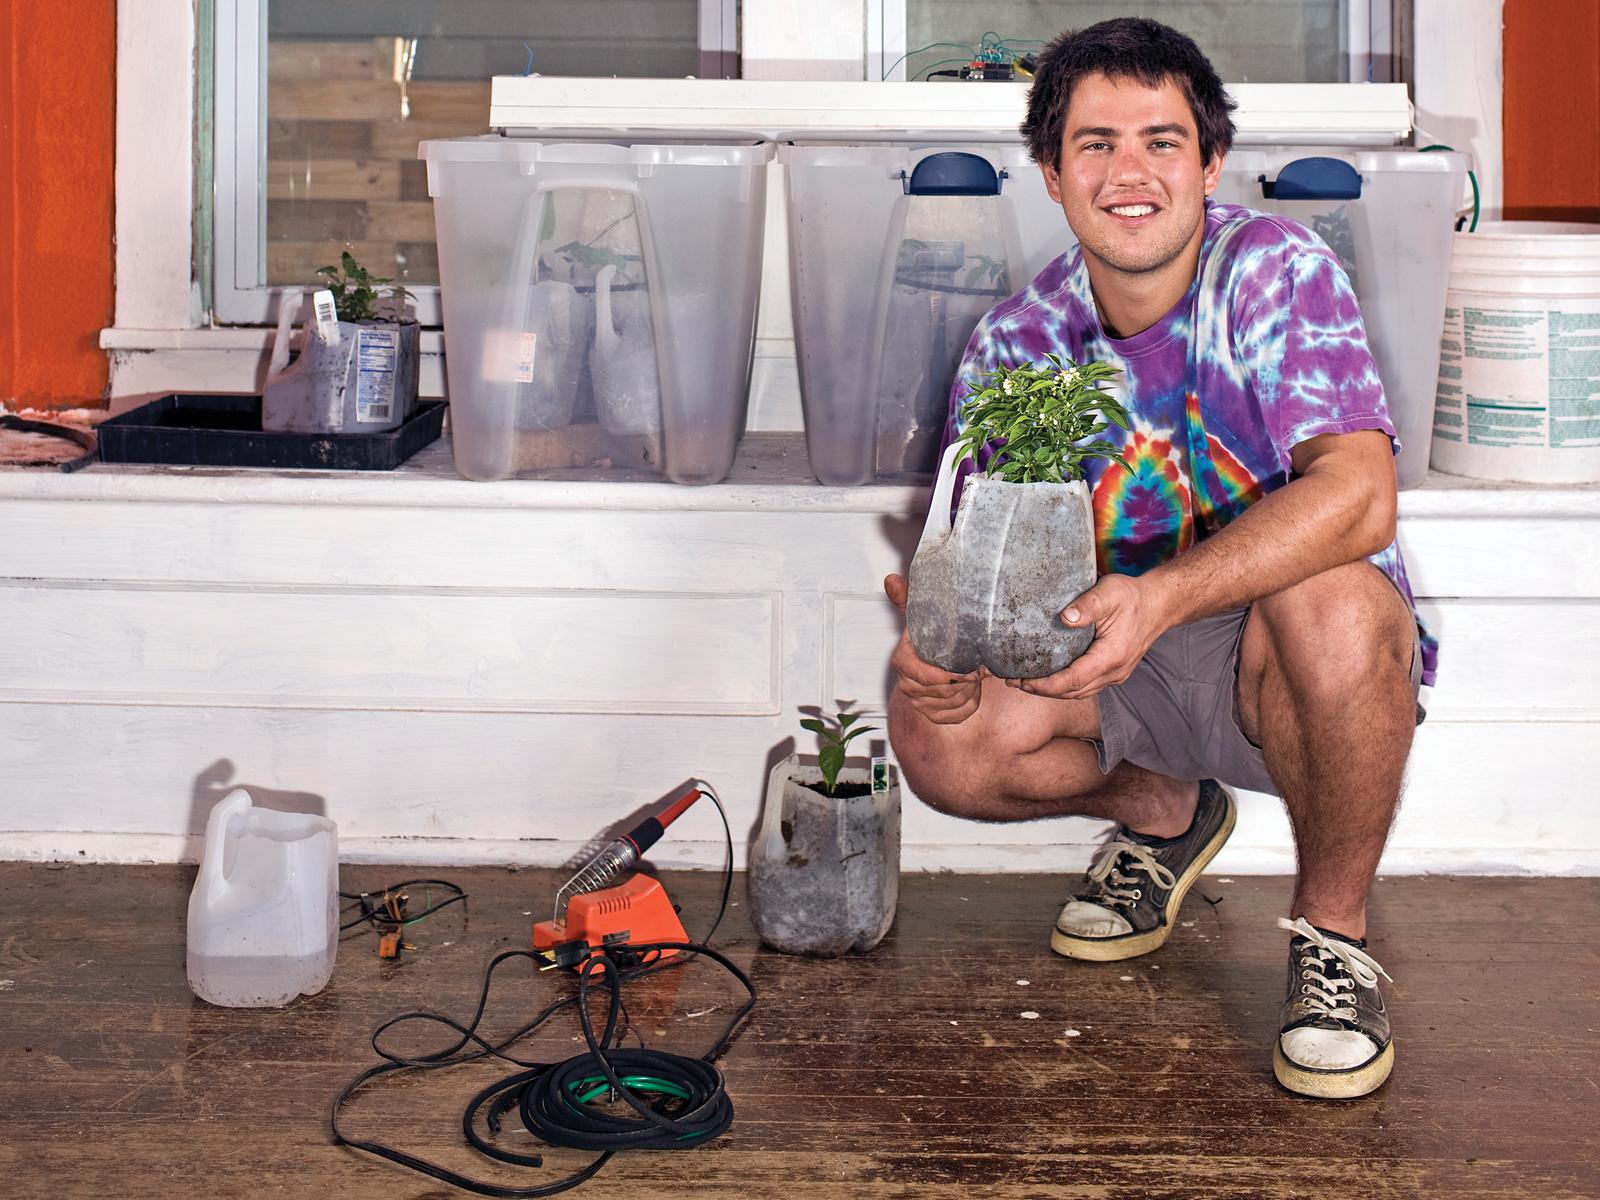 Arduinoを「庭師化」した製品『Garduino』